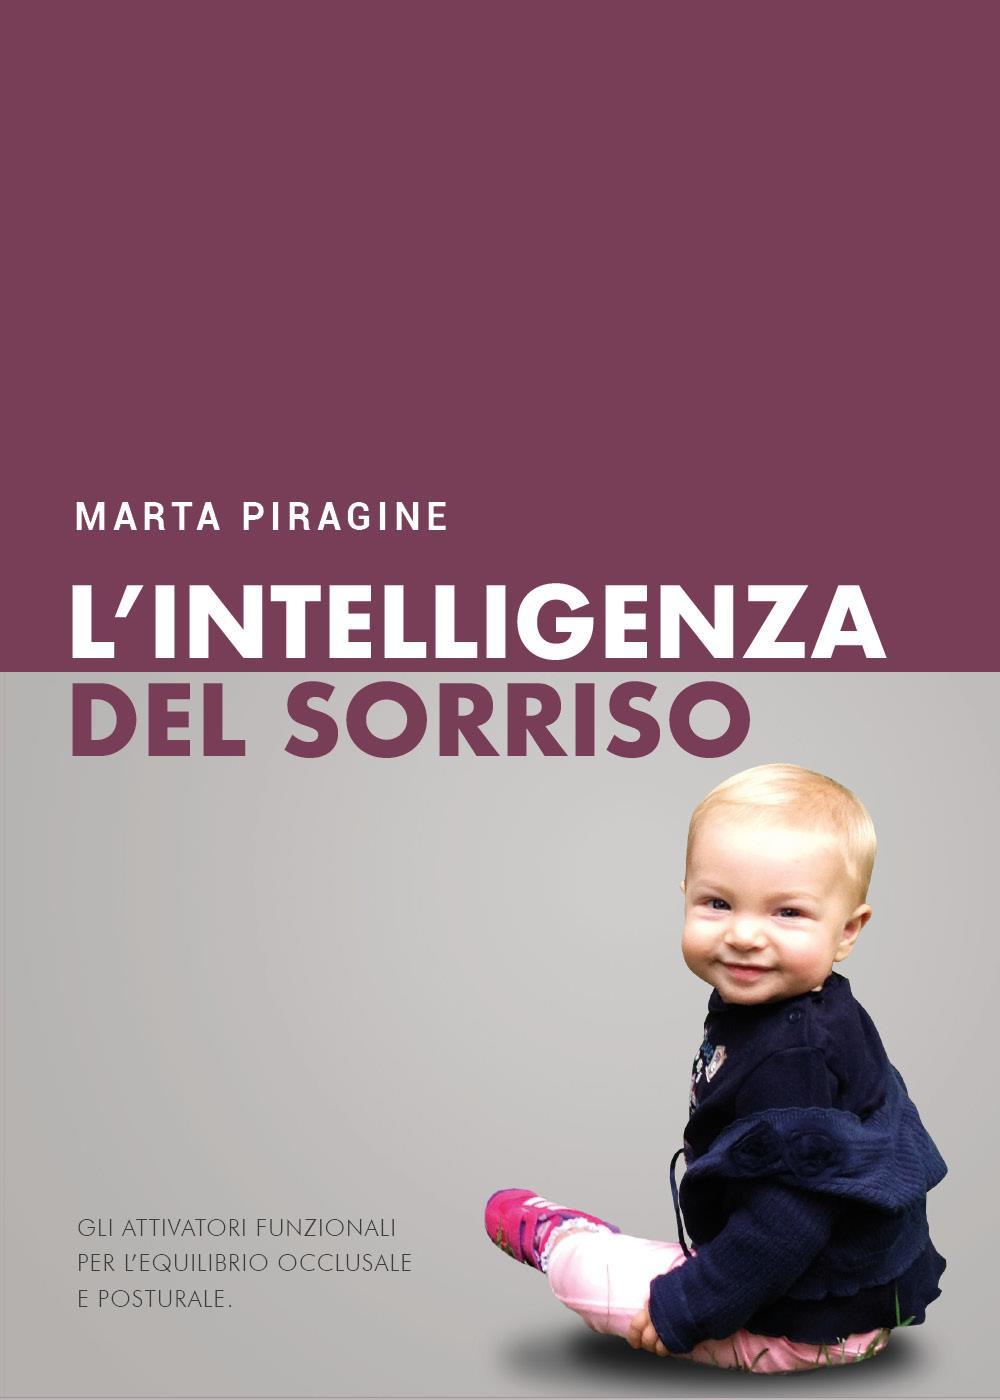 L'intelligenza del sorriso